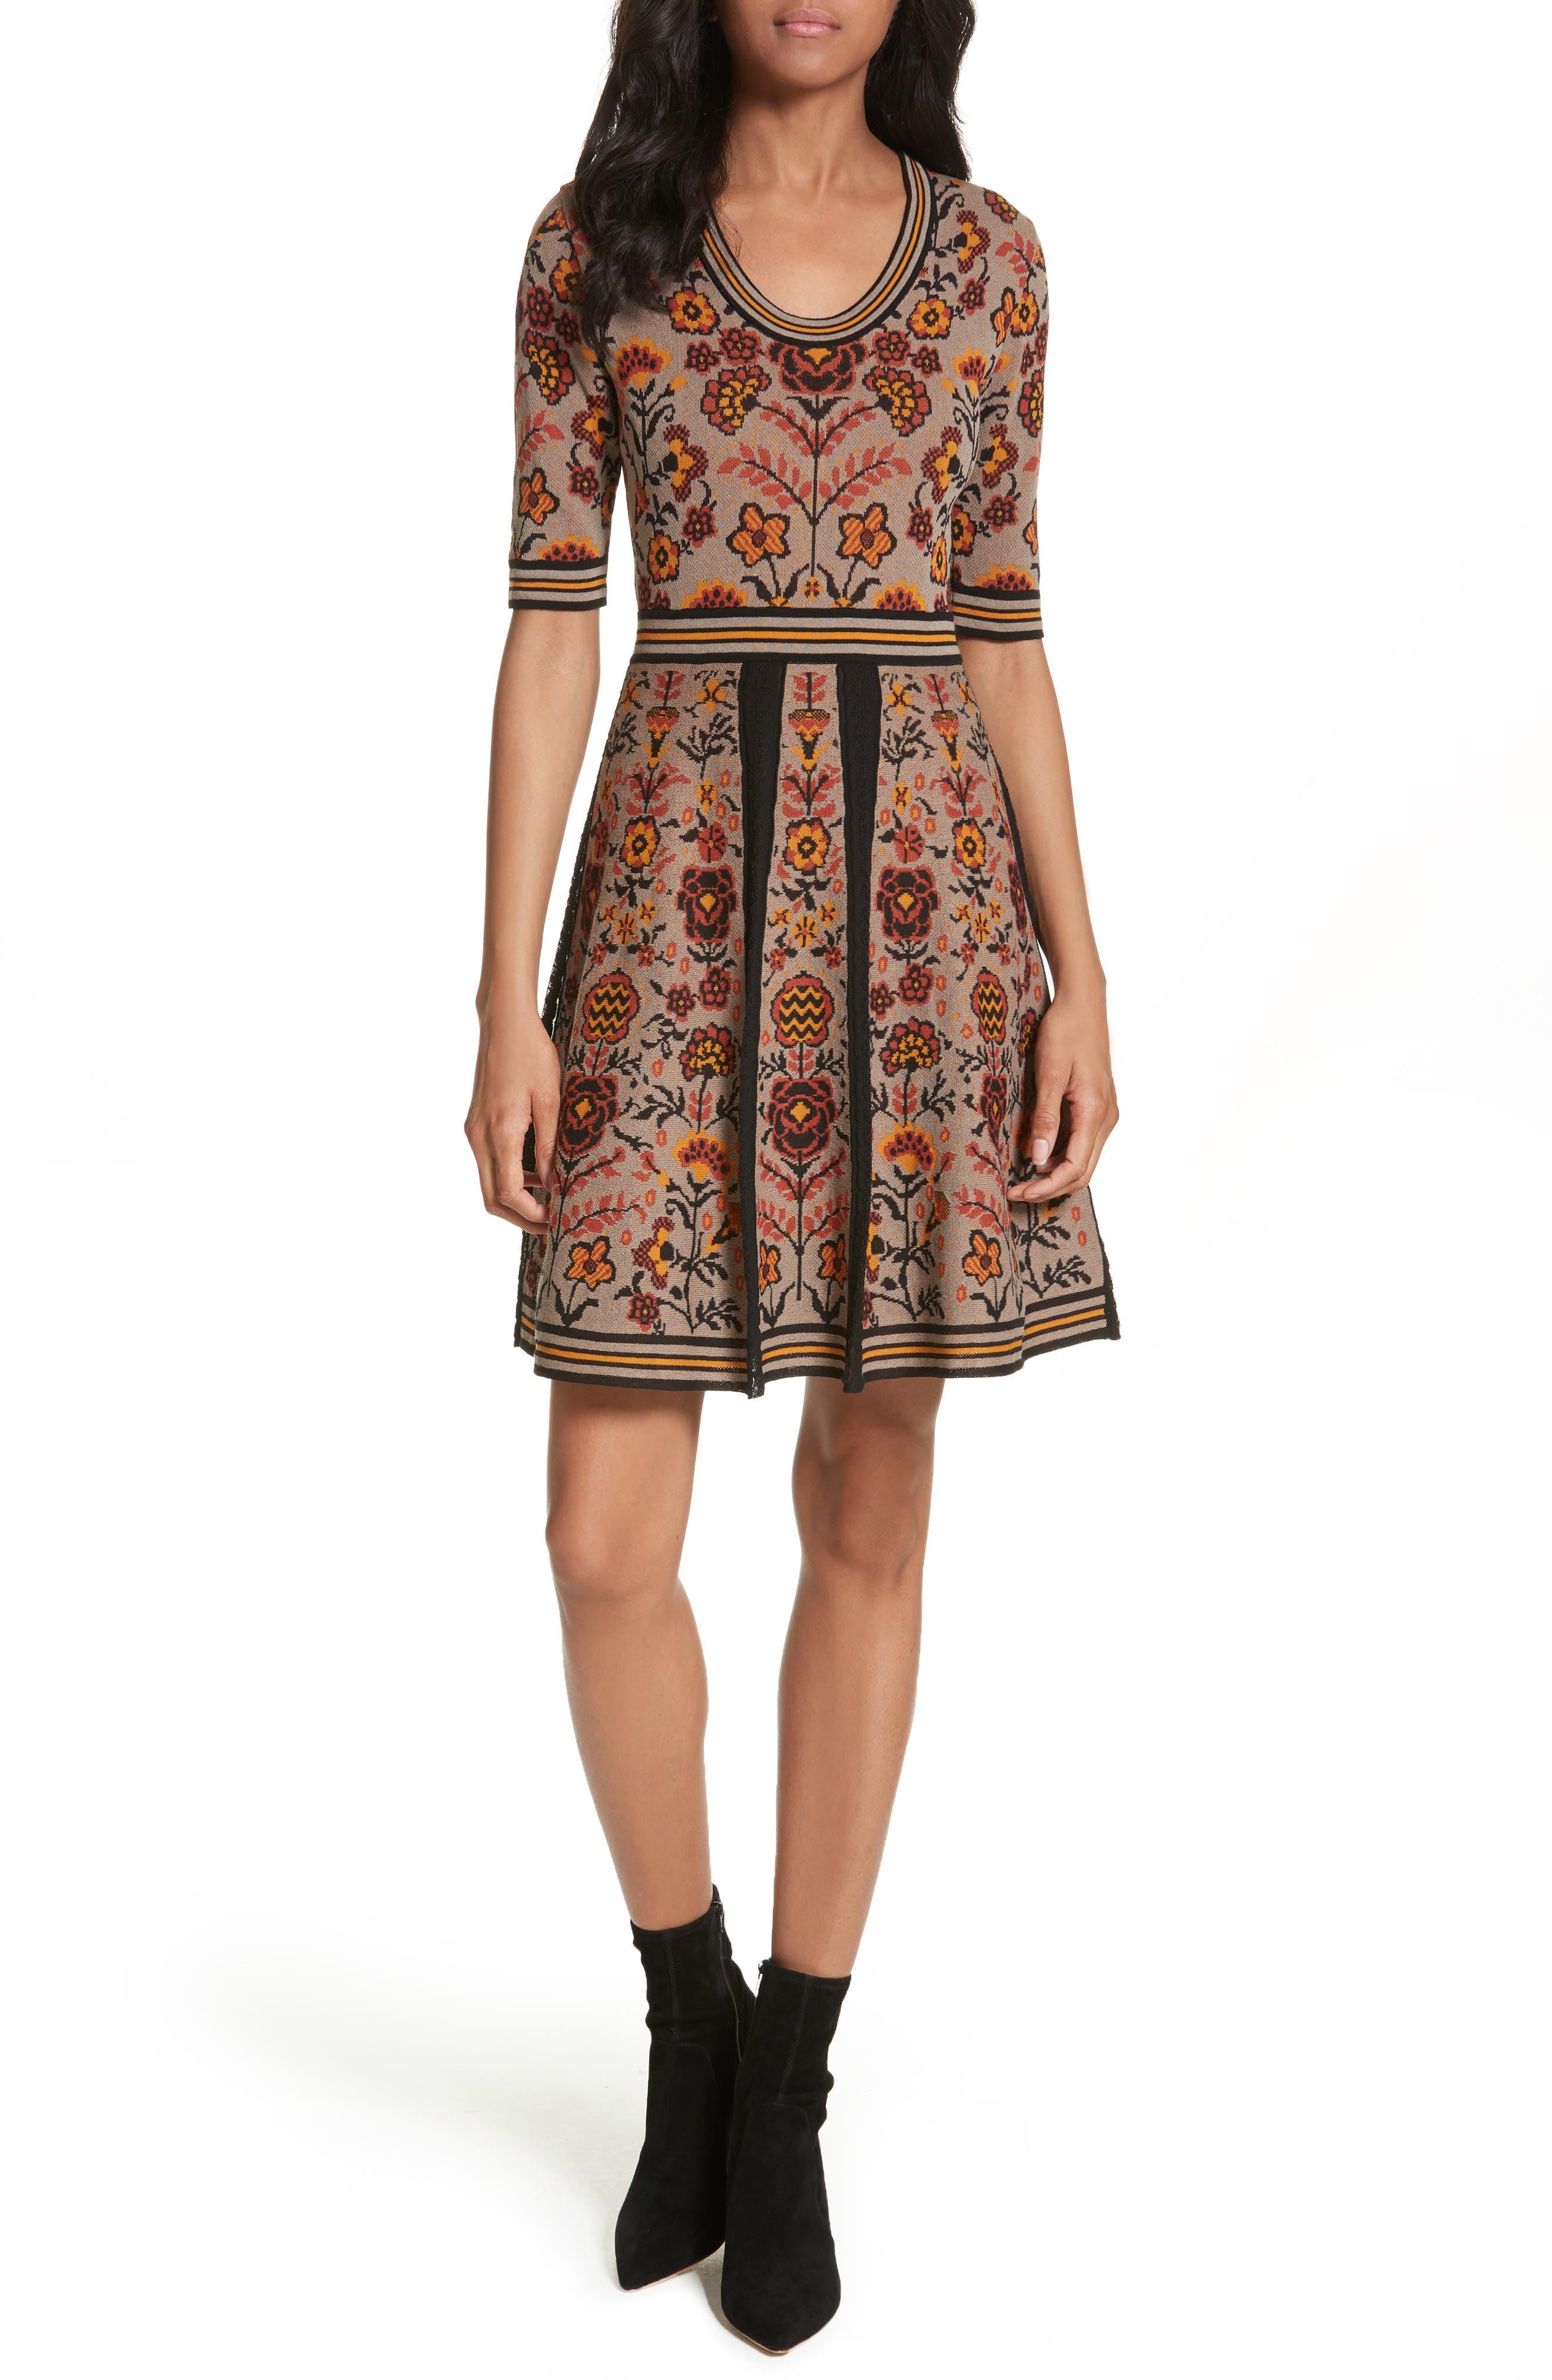 M Missoni Floral Jacquard Knit Dress